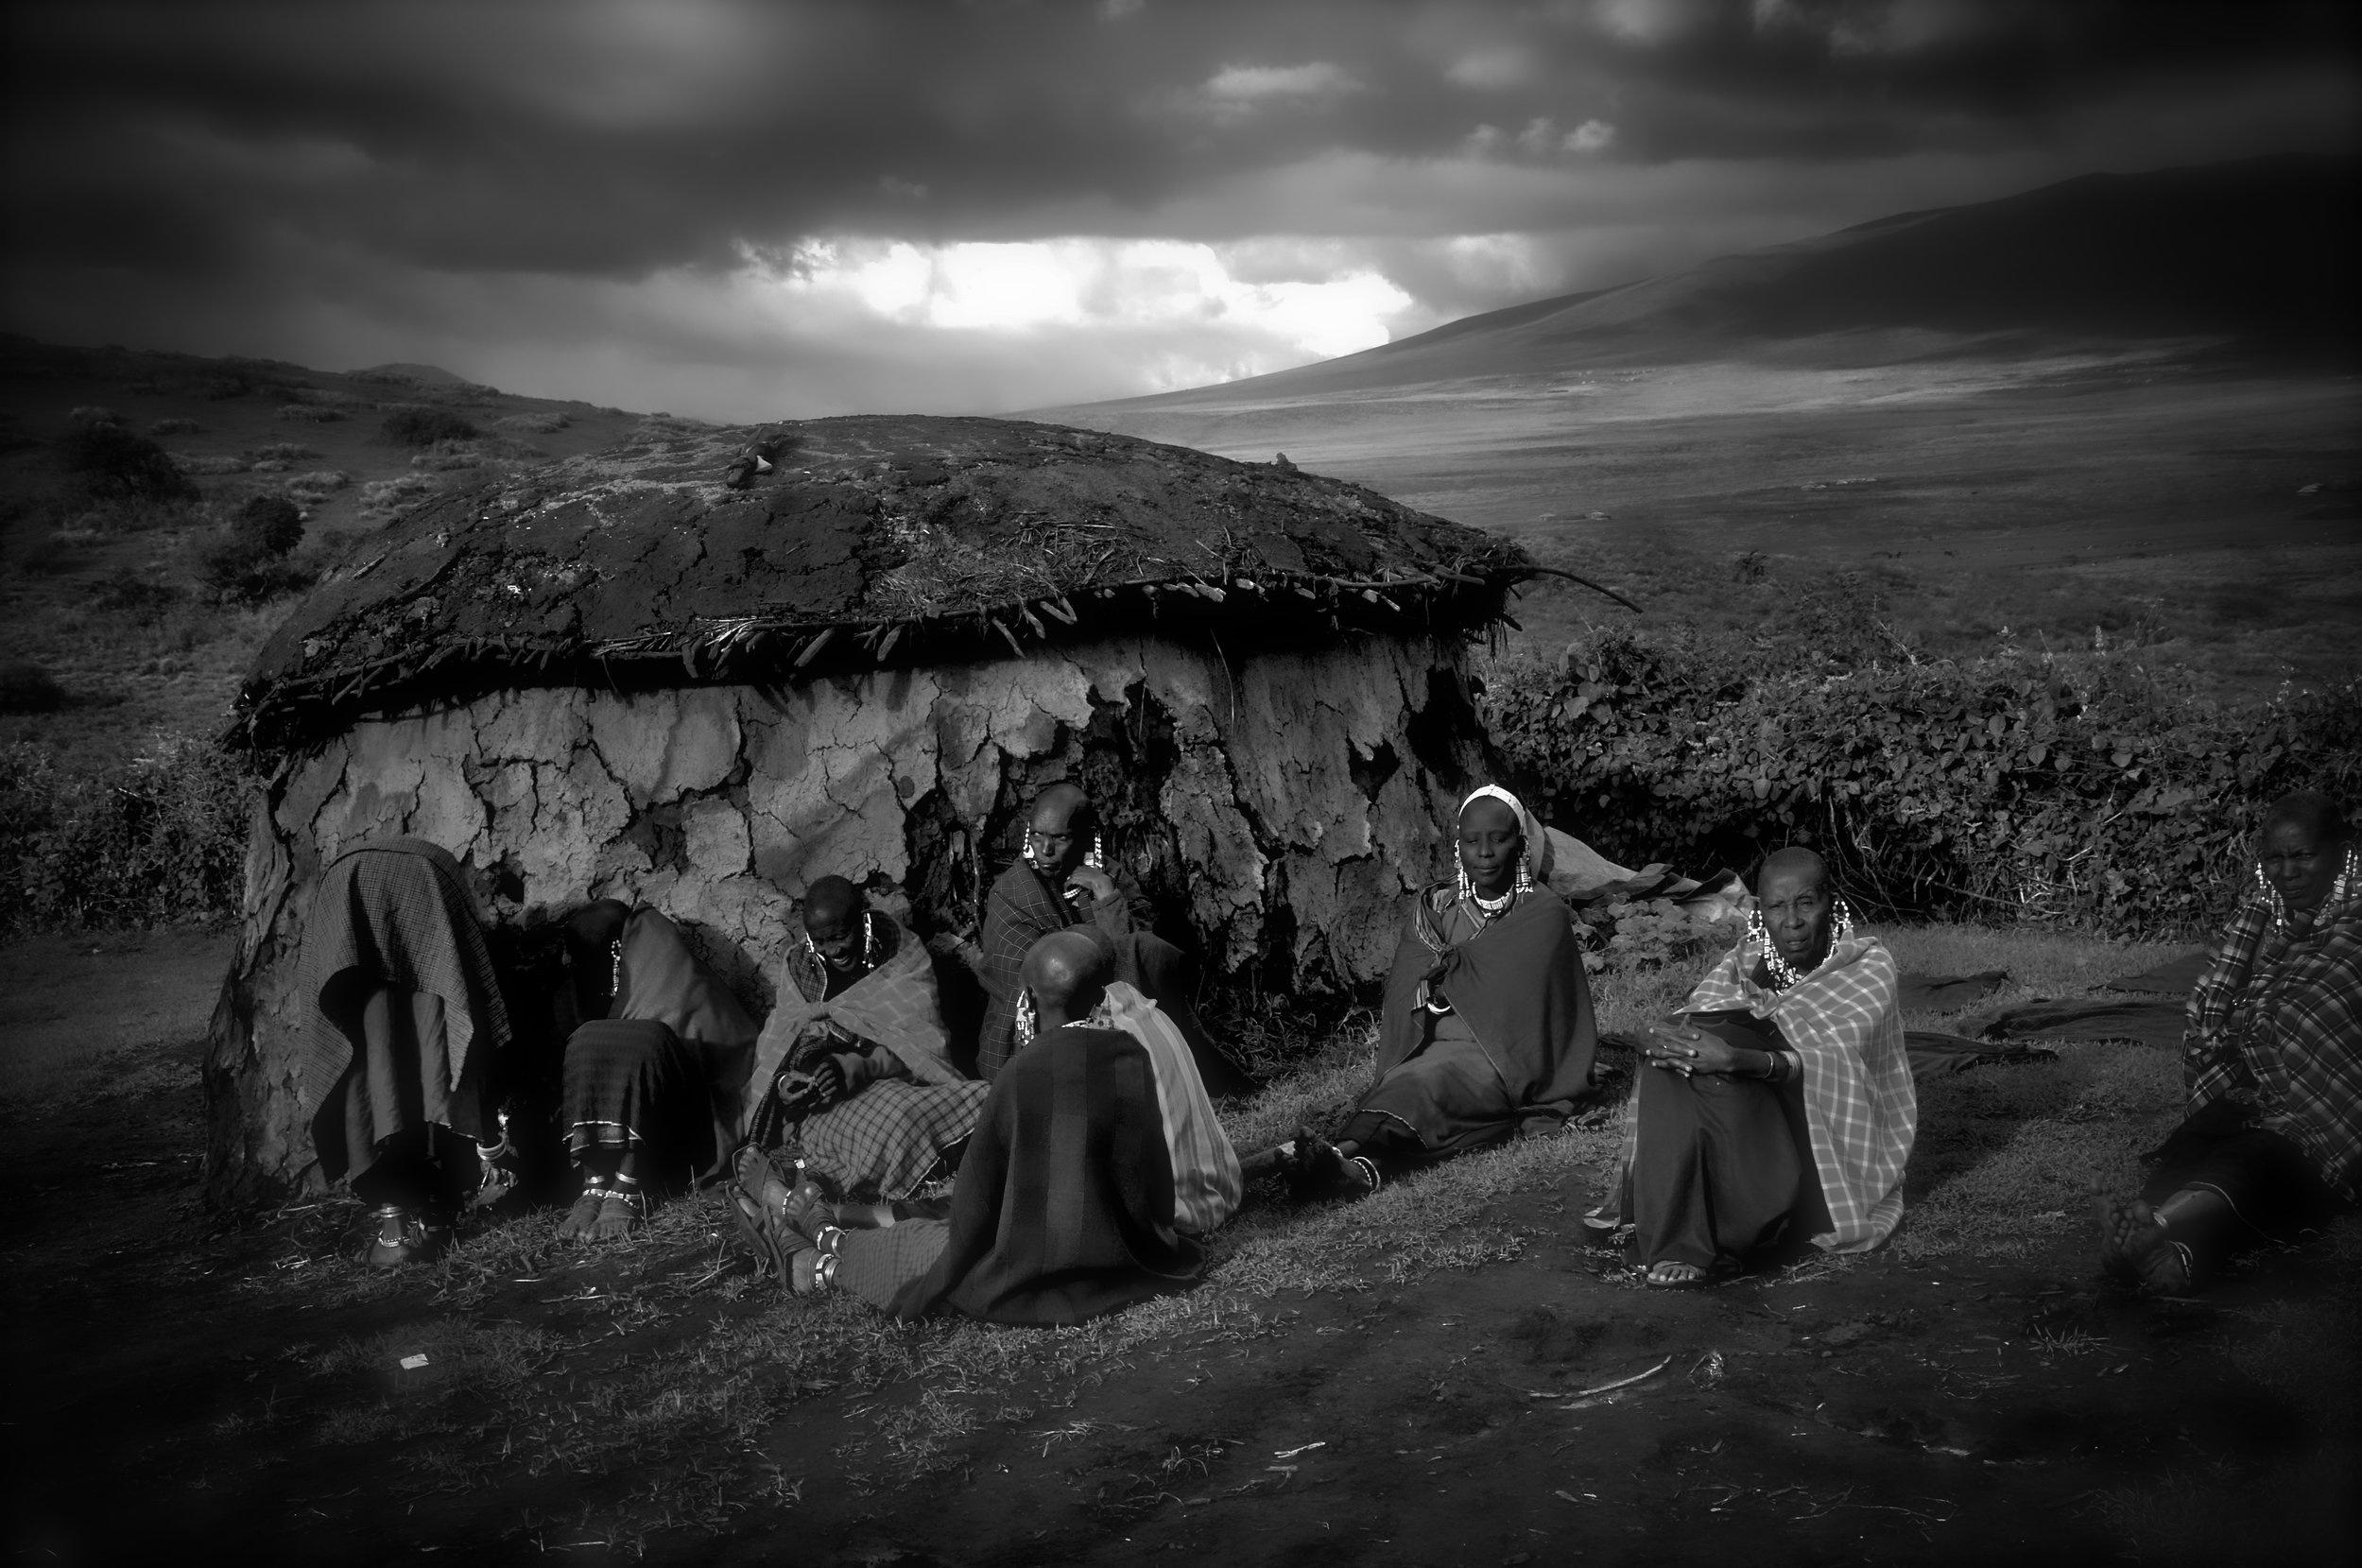 Maasai, Ngorongoro Crater, Tanzania.